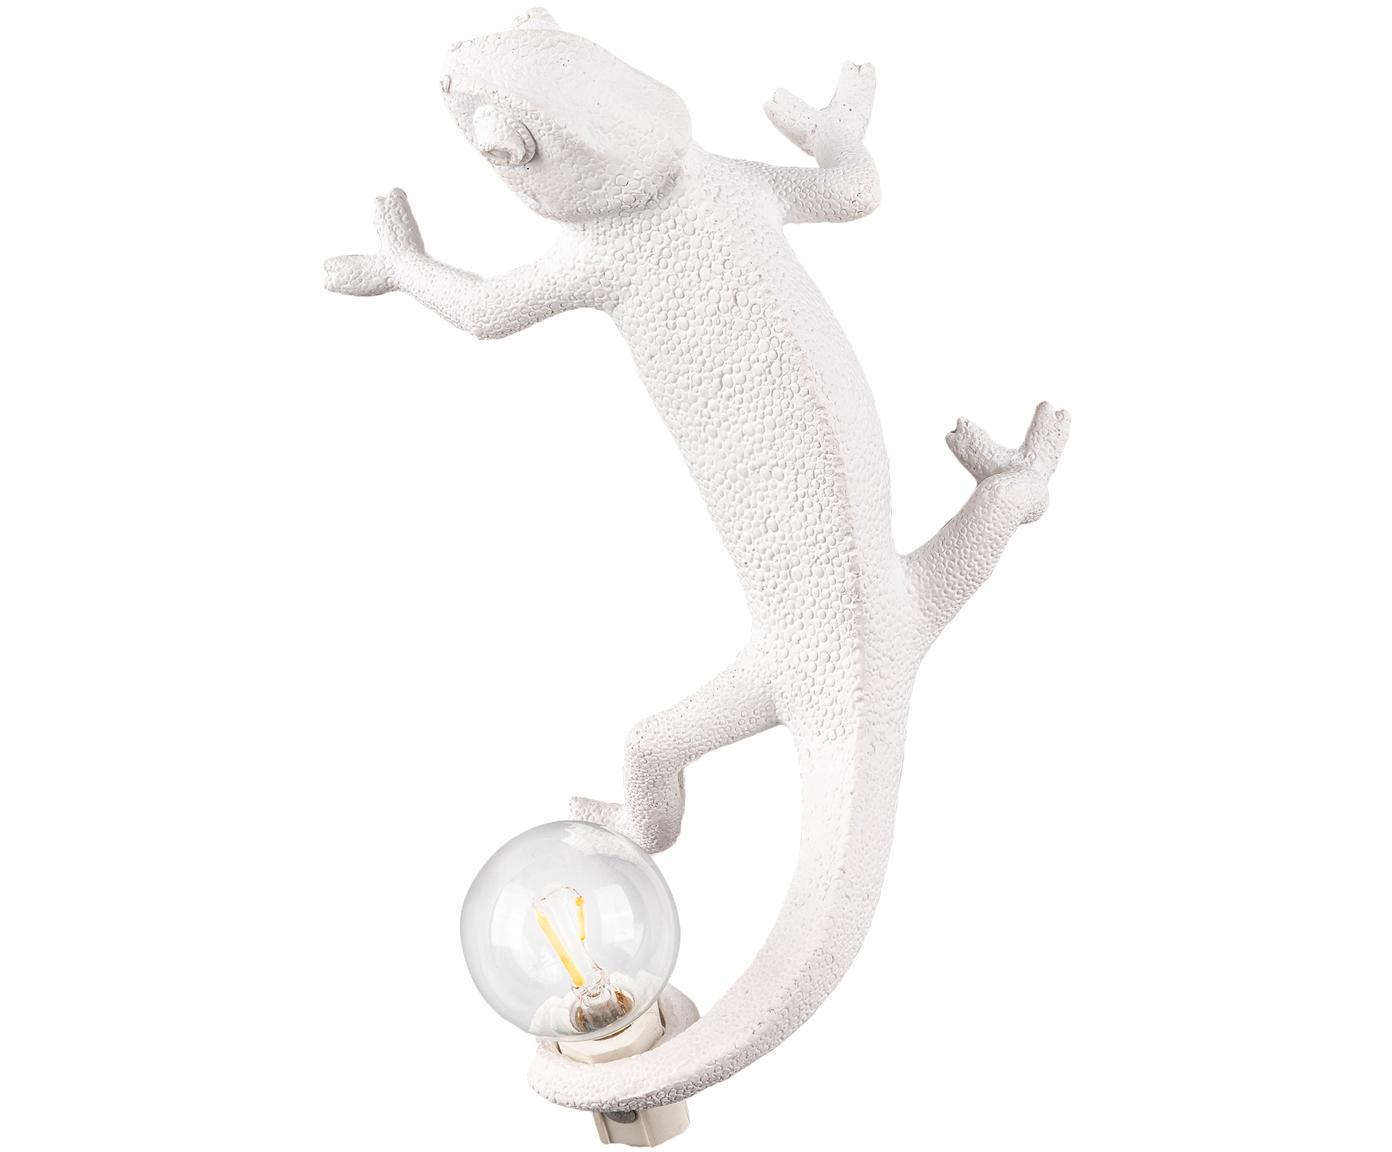 Applique con spina Chameleon, Poliresina, Bianco, Larg. 7 x Alt. 17 cm